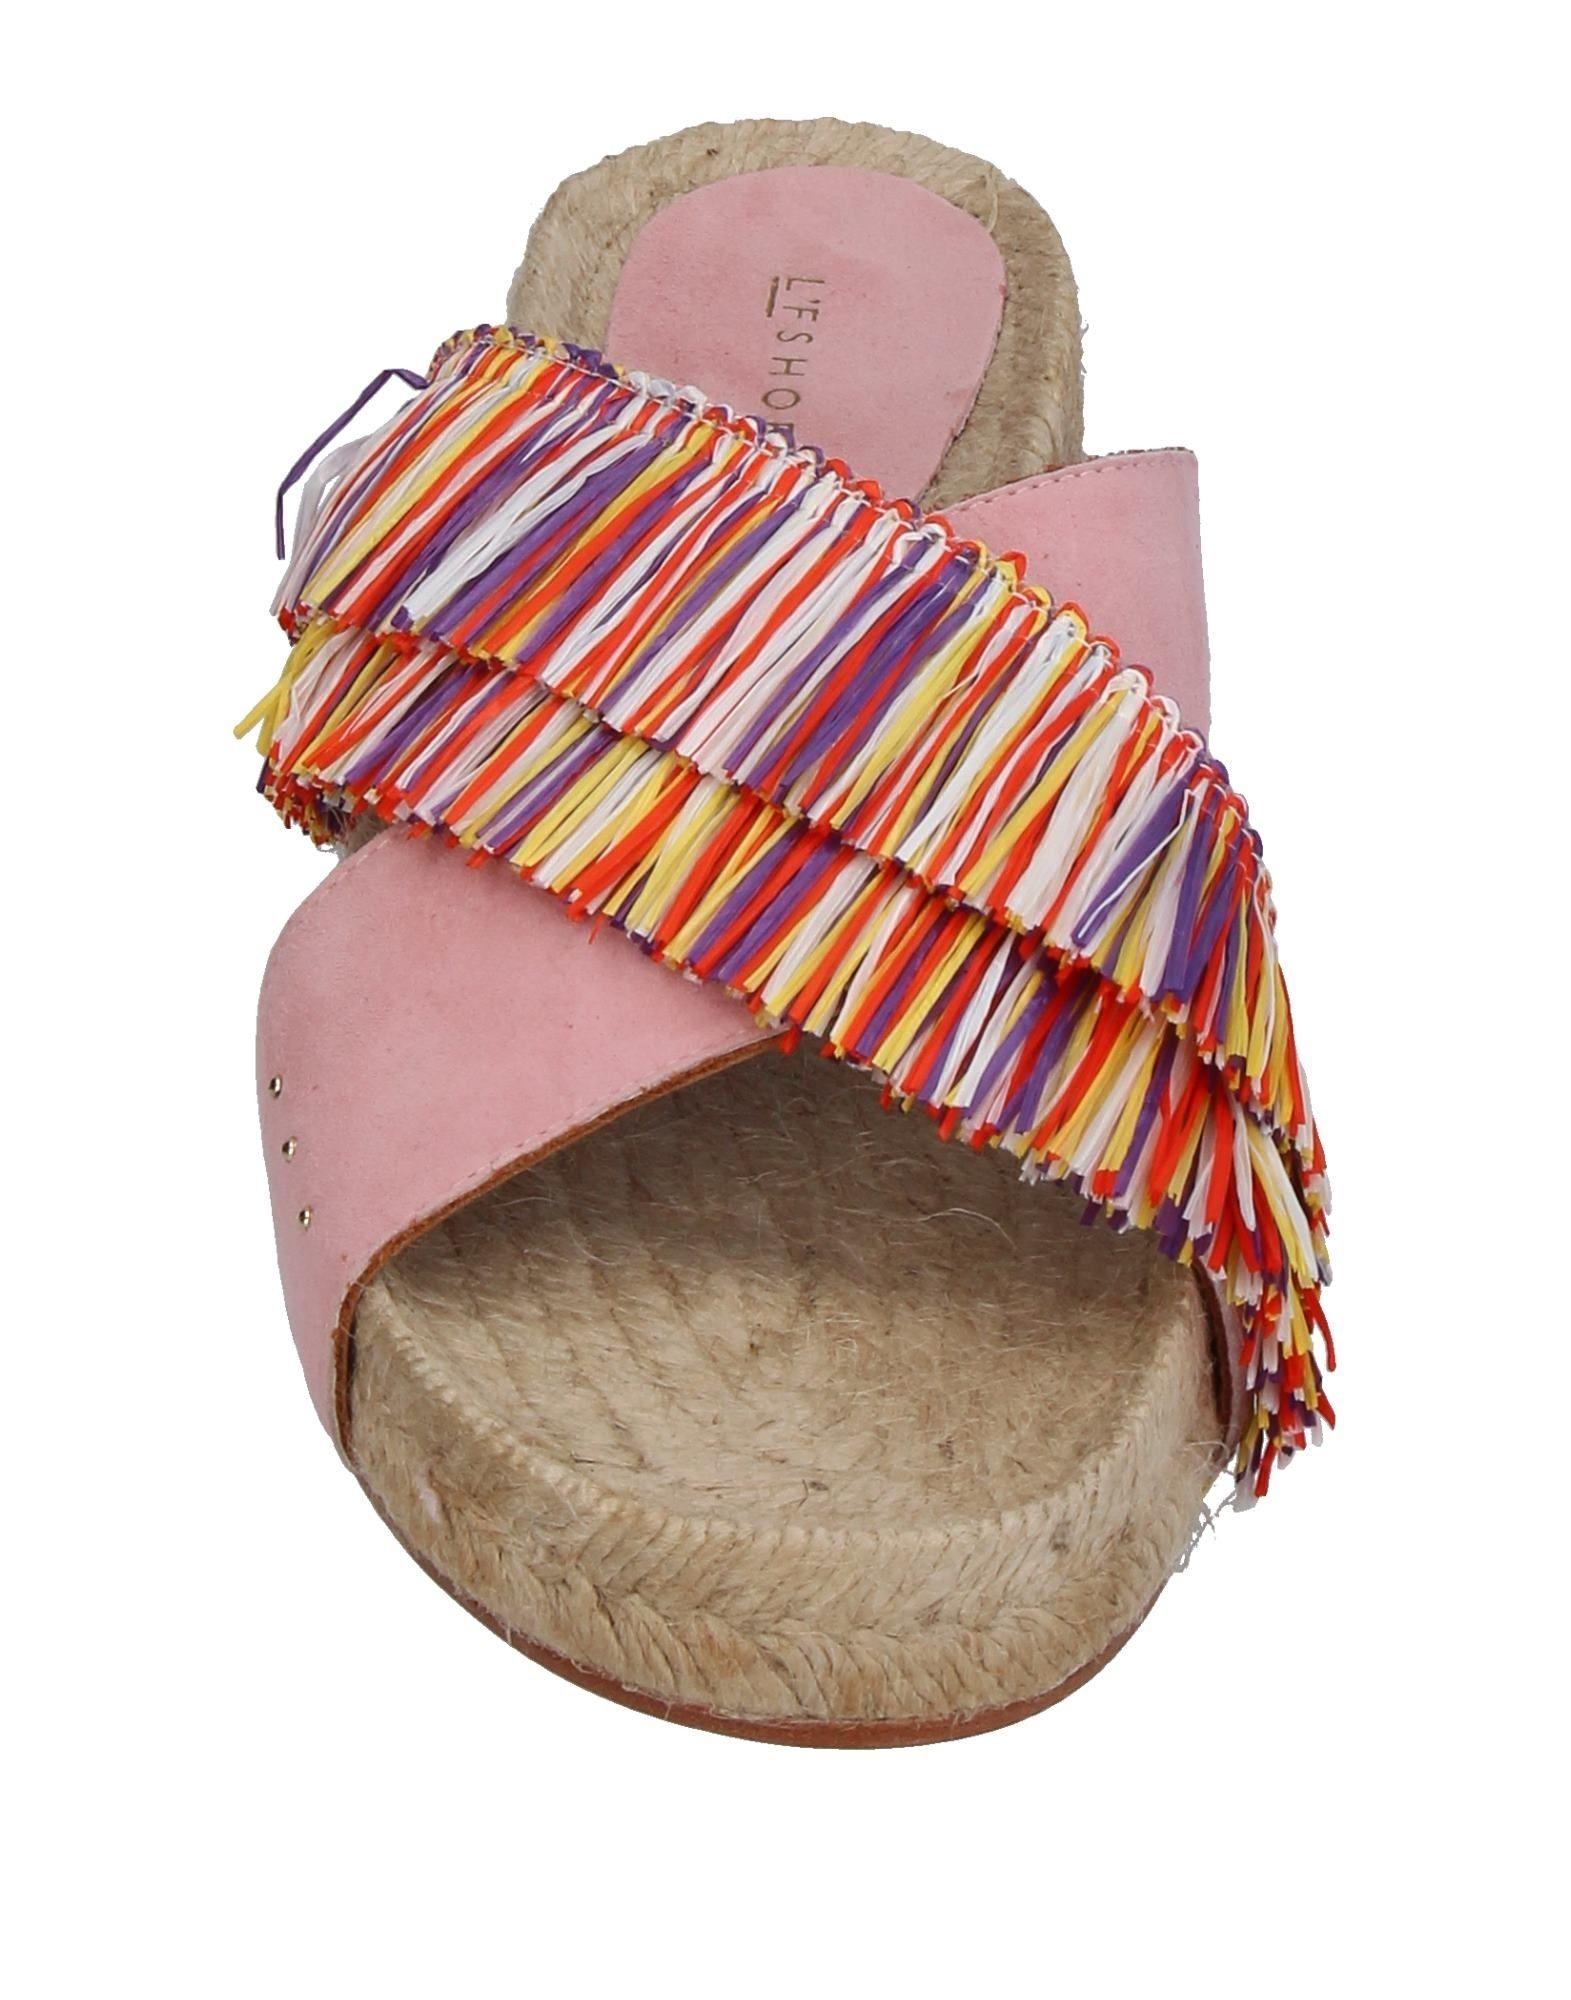 L'f Shoes Sandalen Damen  11416086WE 11416086WE  Neue Schuhe 181611